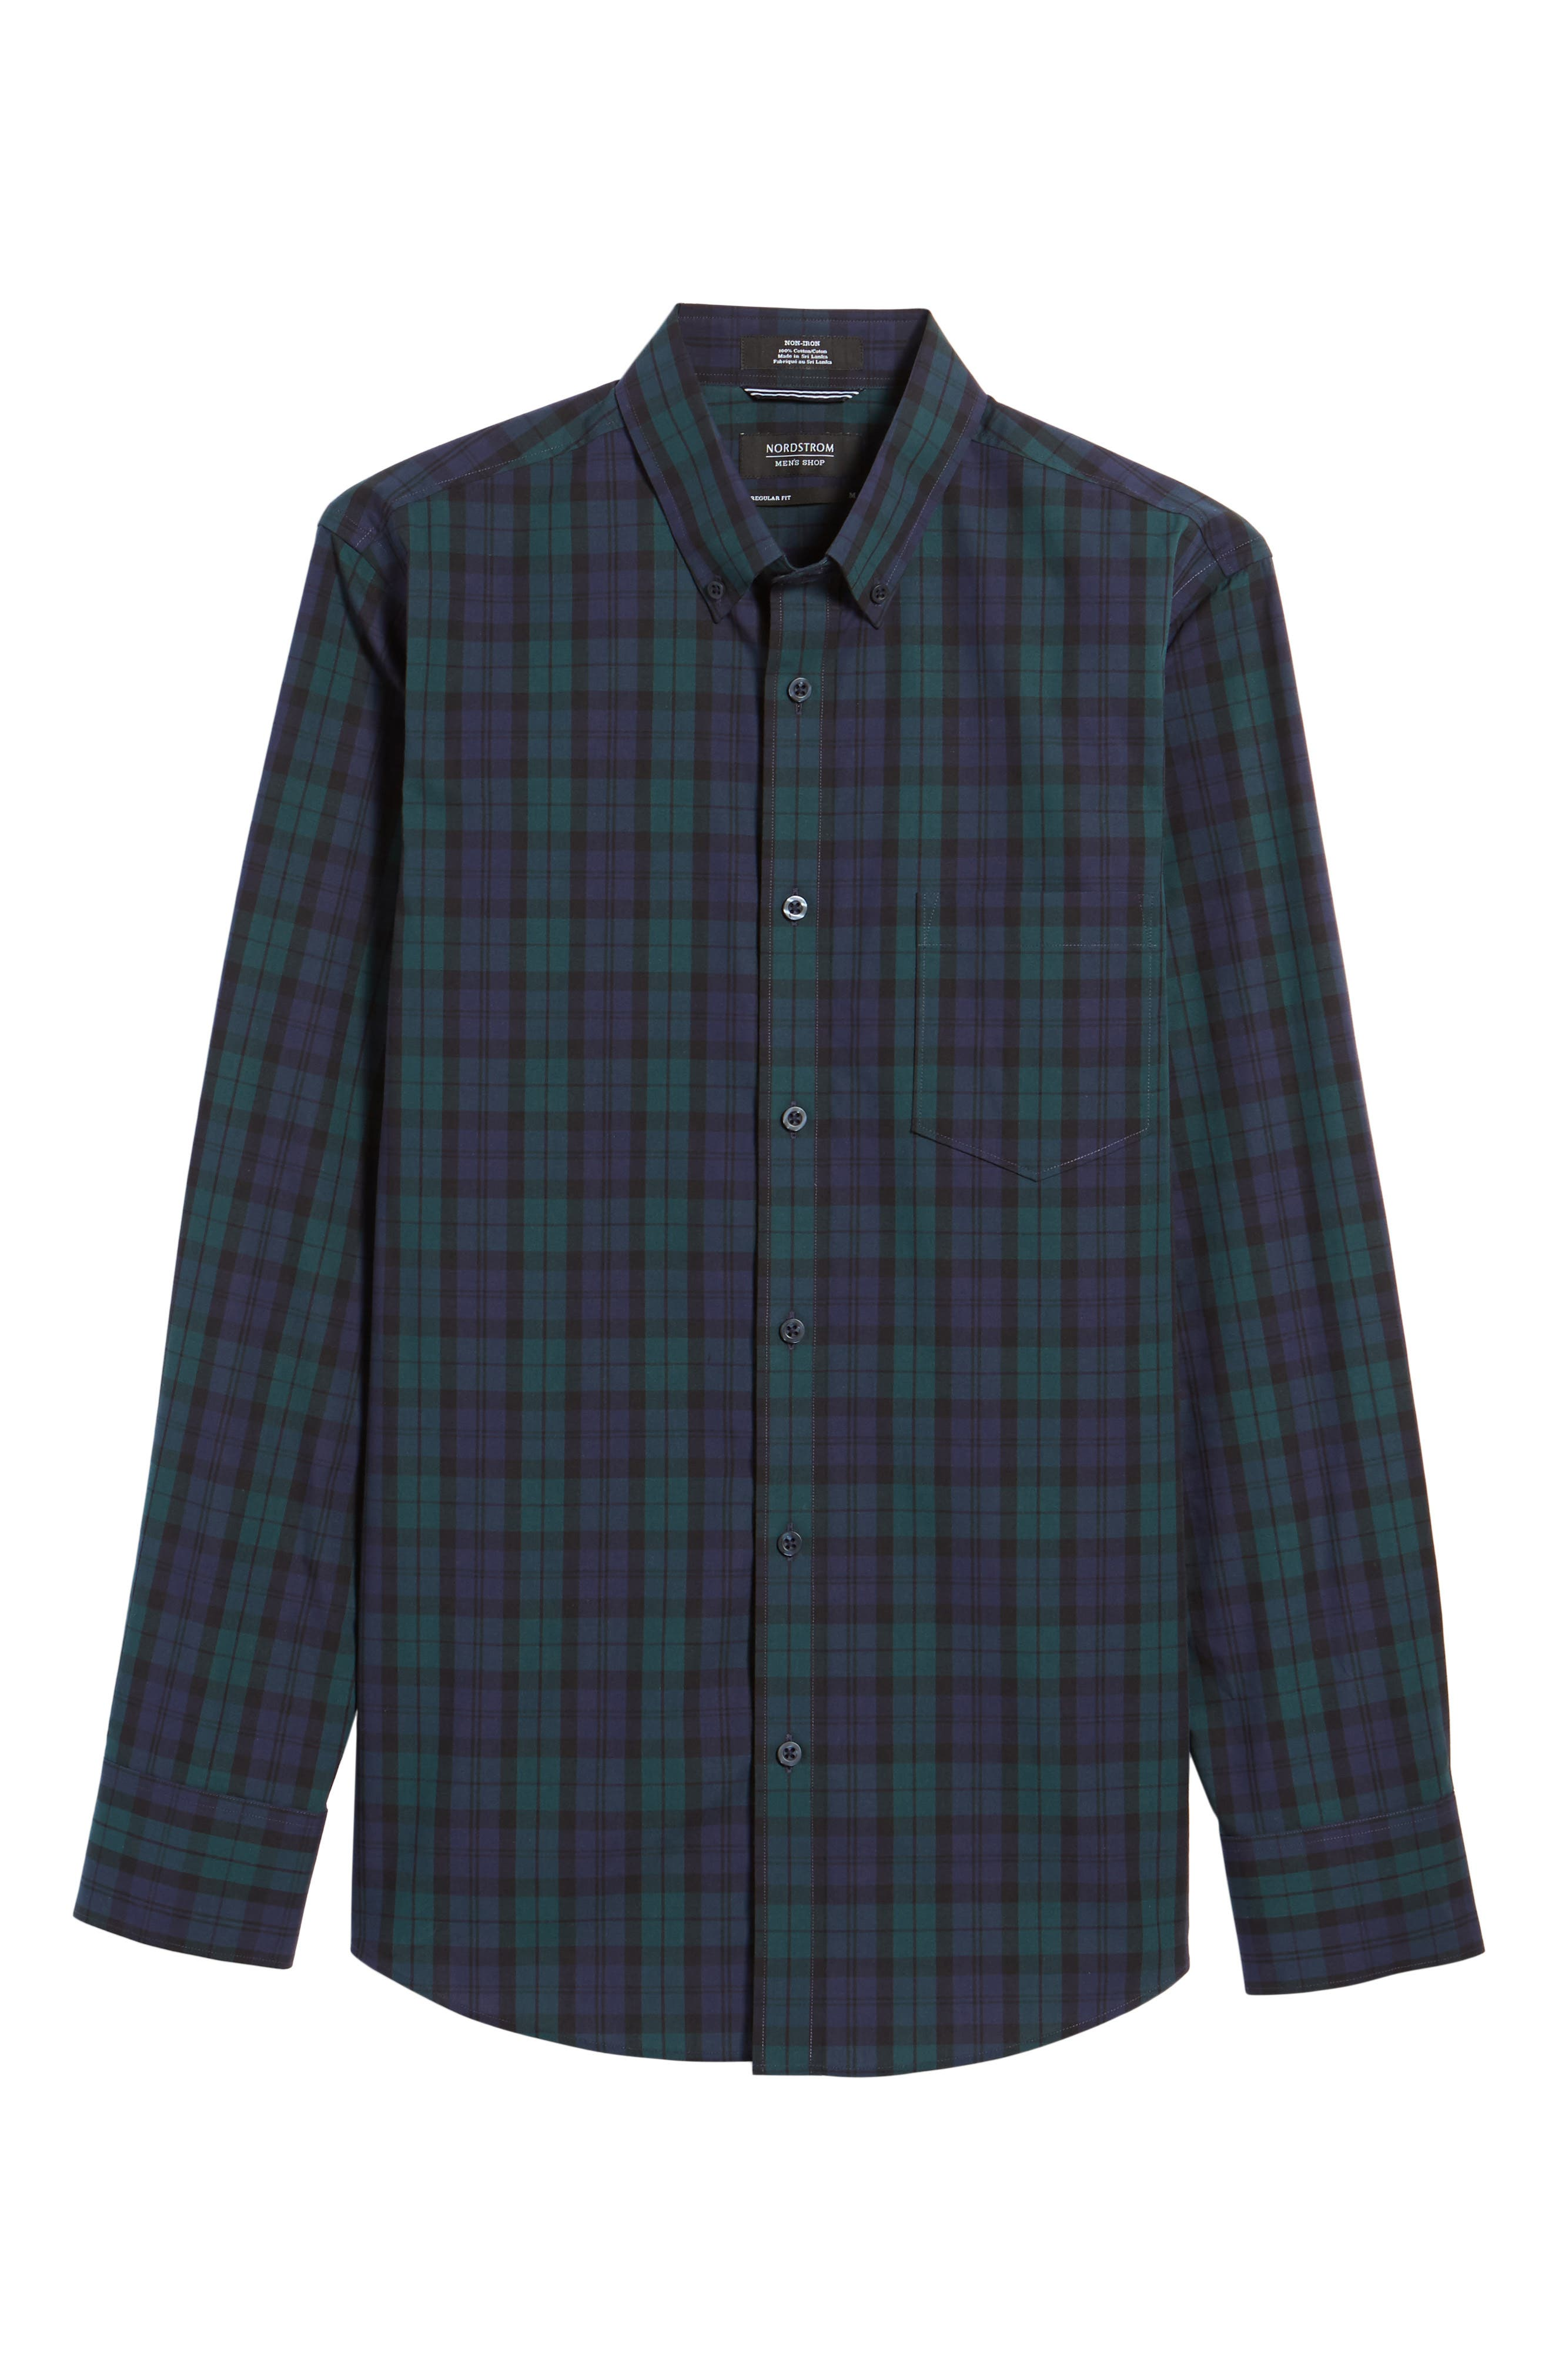 Regular Fit Non-Iron Plaid Sport Shirt,                             Alternate thumbnail 6, color,                             Green Bug Navy Tartan